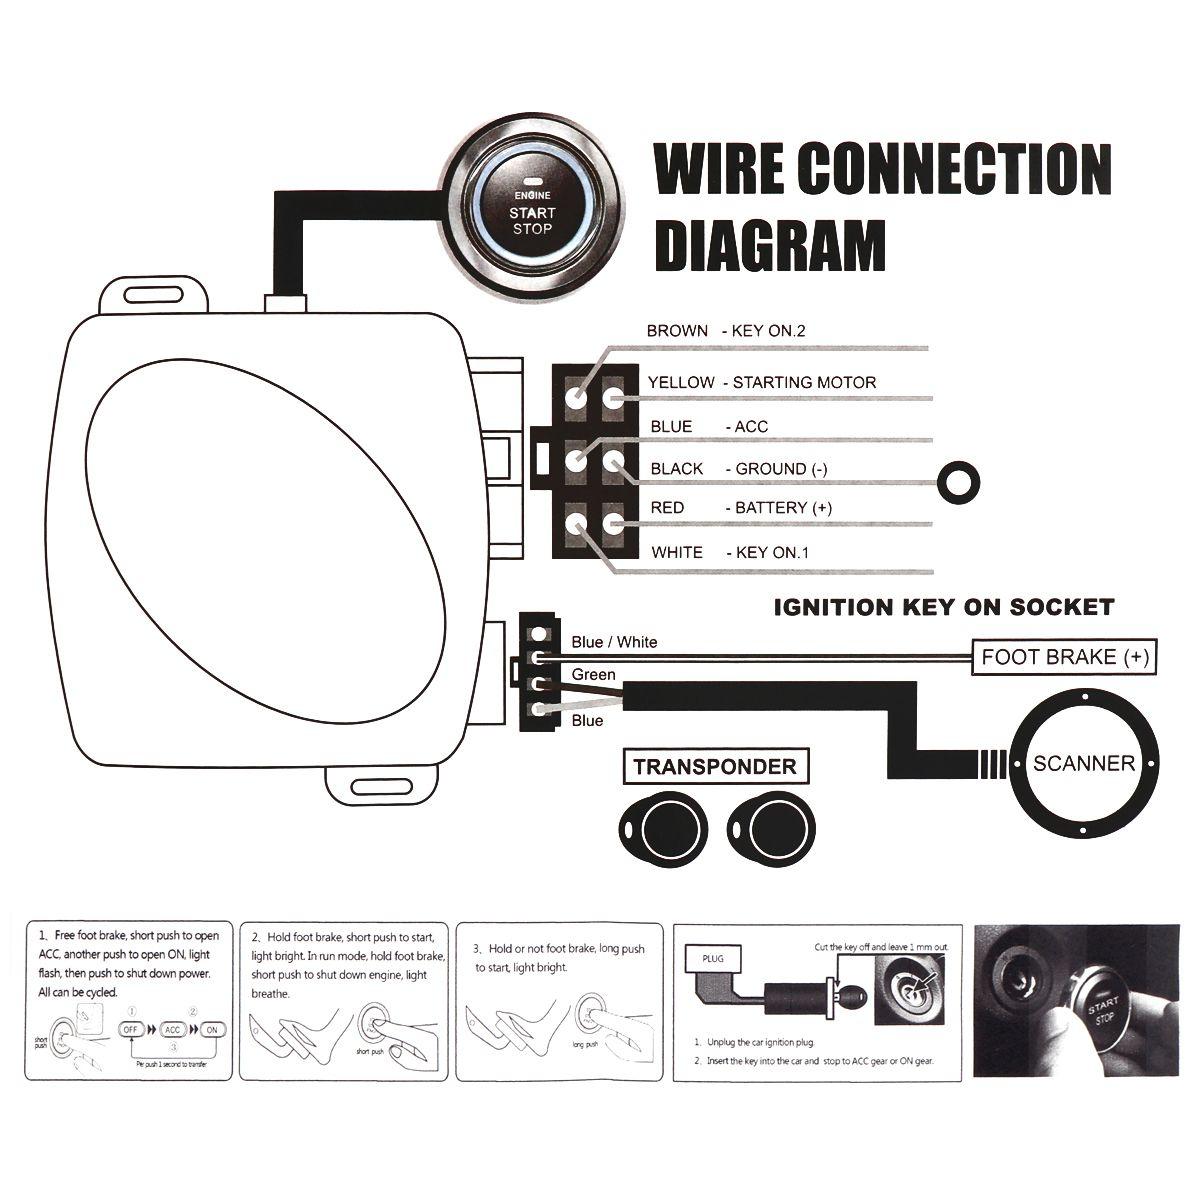 Evrensel 12 V Oto RFID Araba Alarm Sistemi ve Totemeli kilit Anti-hırsızlık Push Start Sistemi CAL_10G